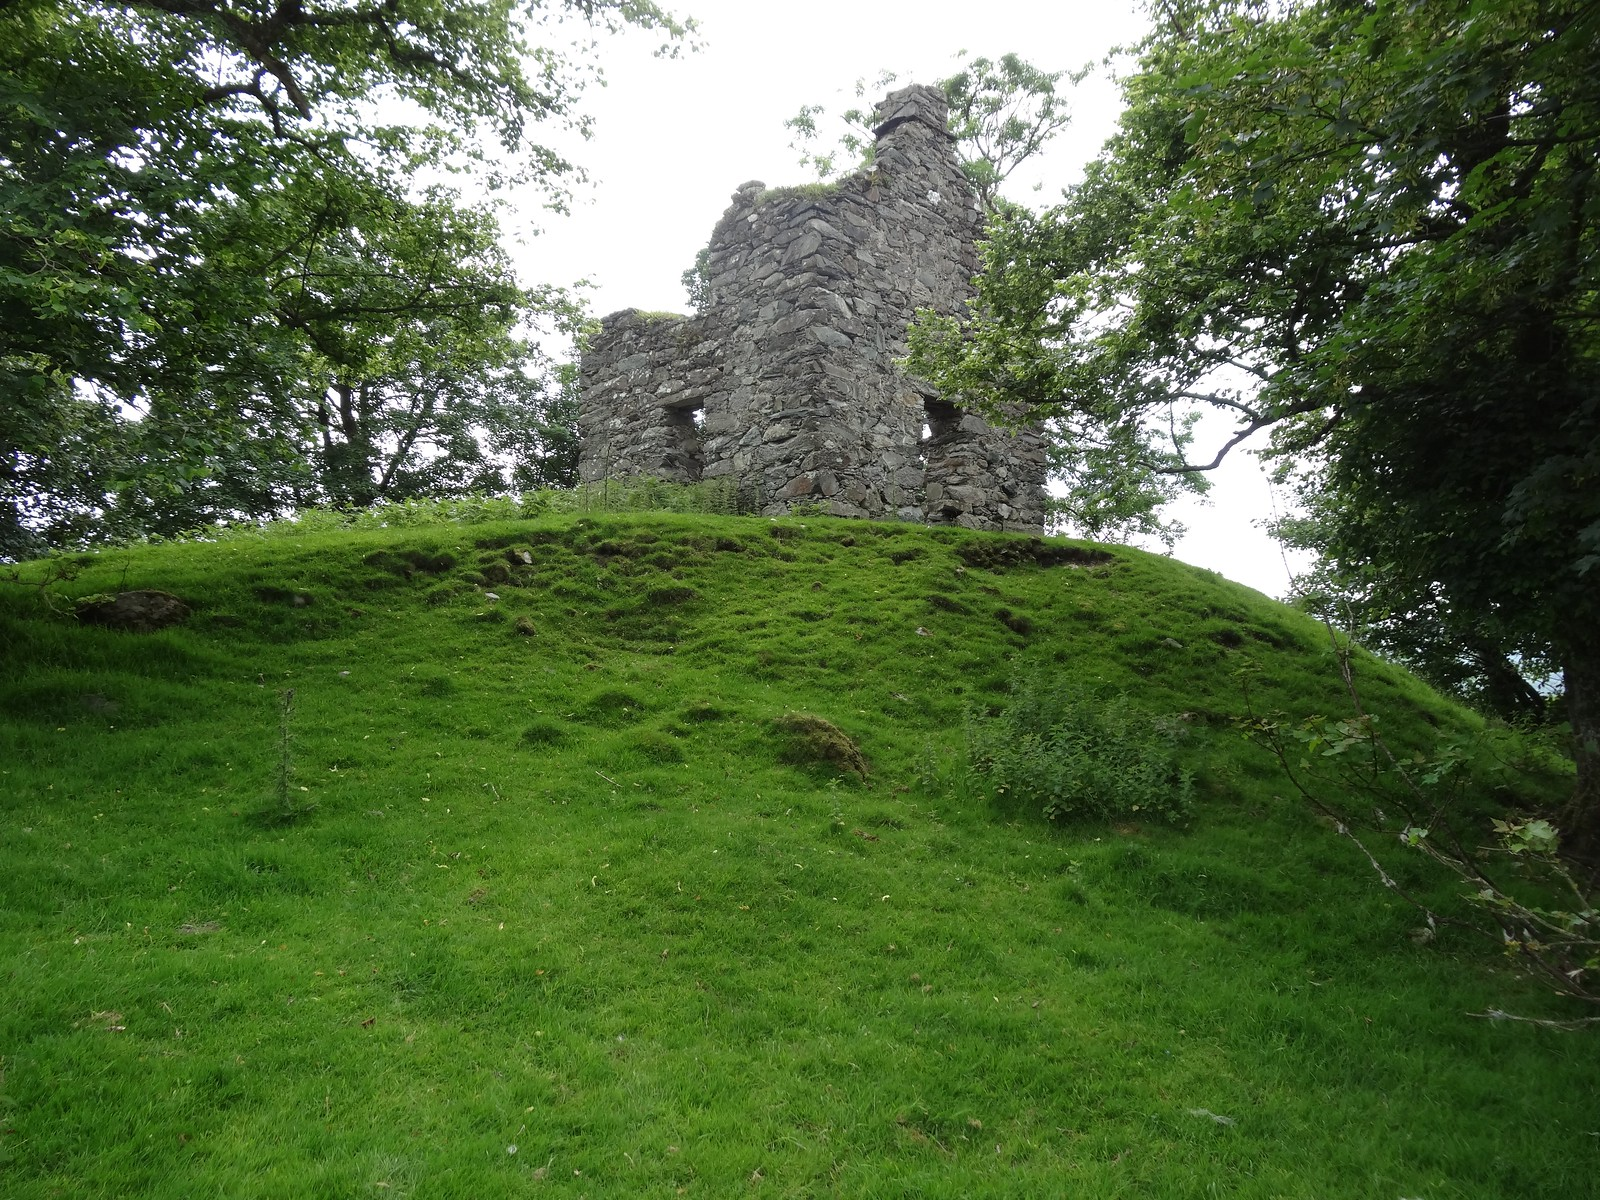 Old Stone Building on the Site of Cymer Castle, Llanelltyd, Dolgellau